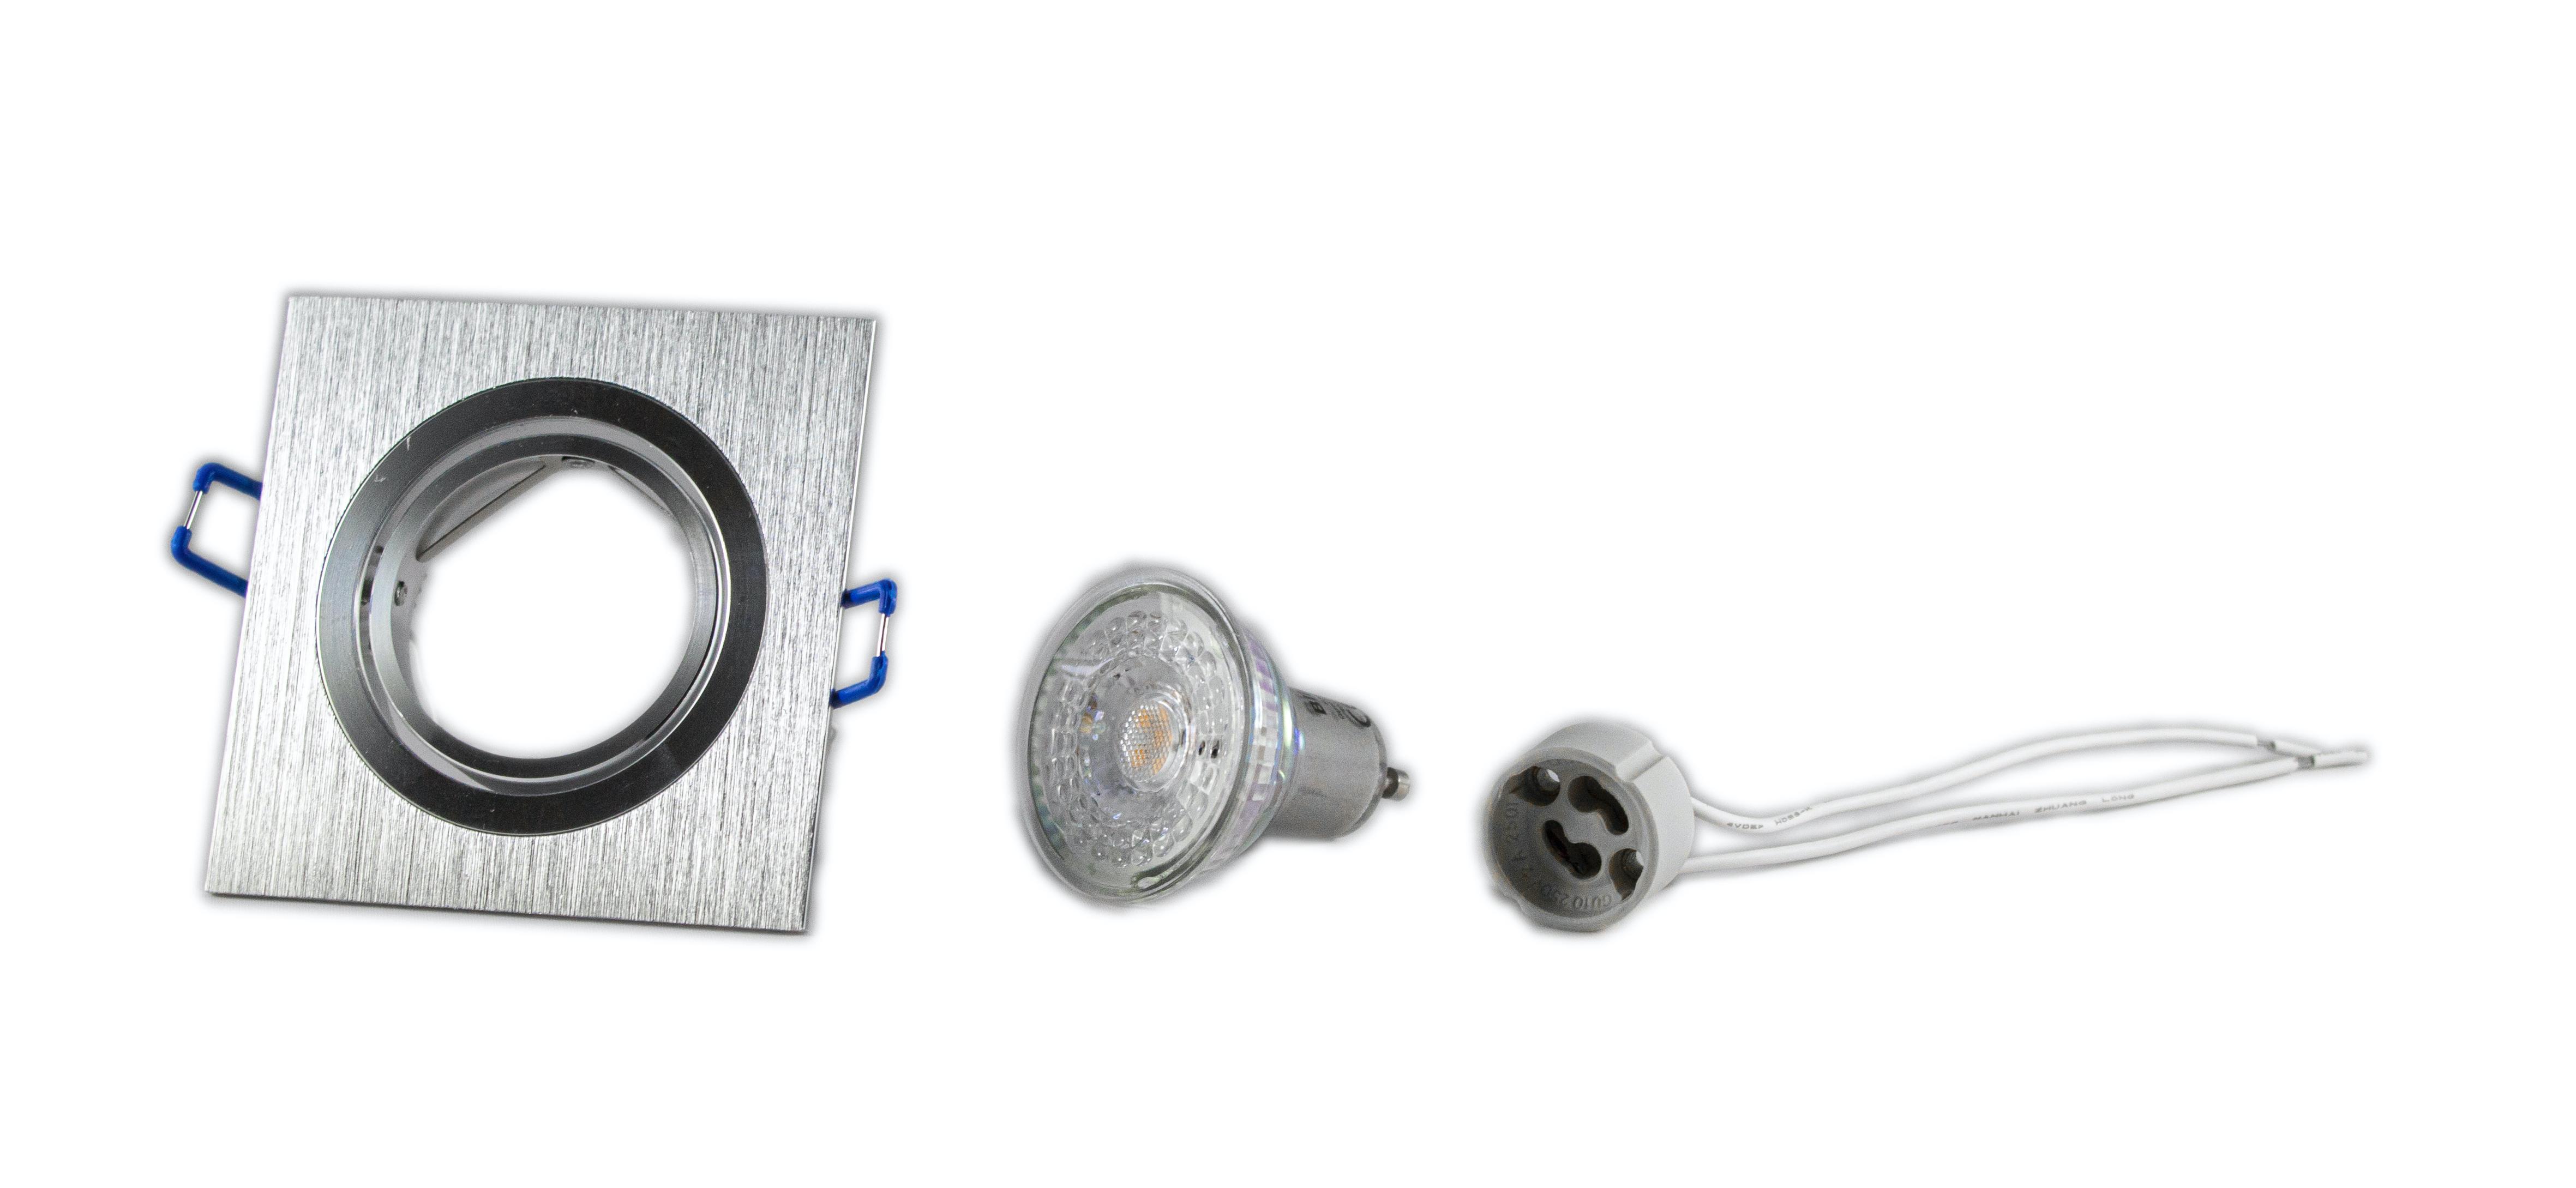 LED dimbare inbouw spot geborsteld aluminium - vierkant - 2700K - onderdelen